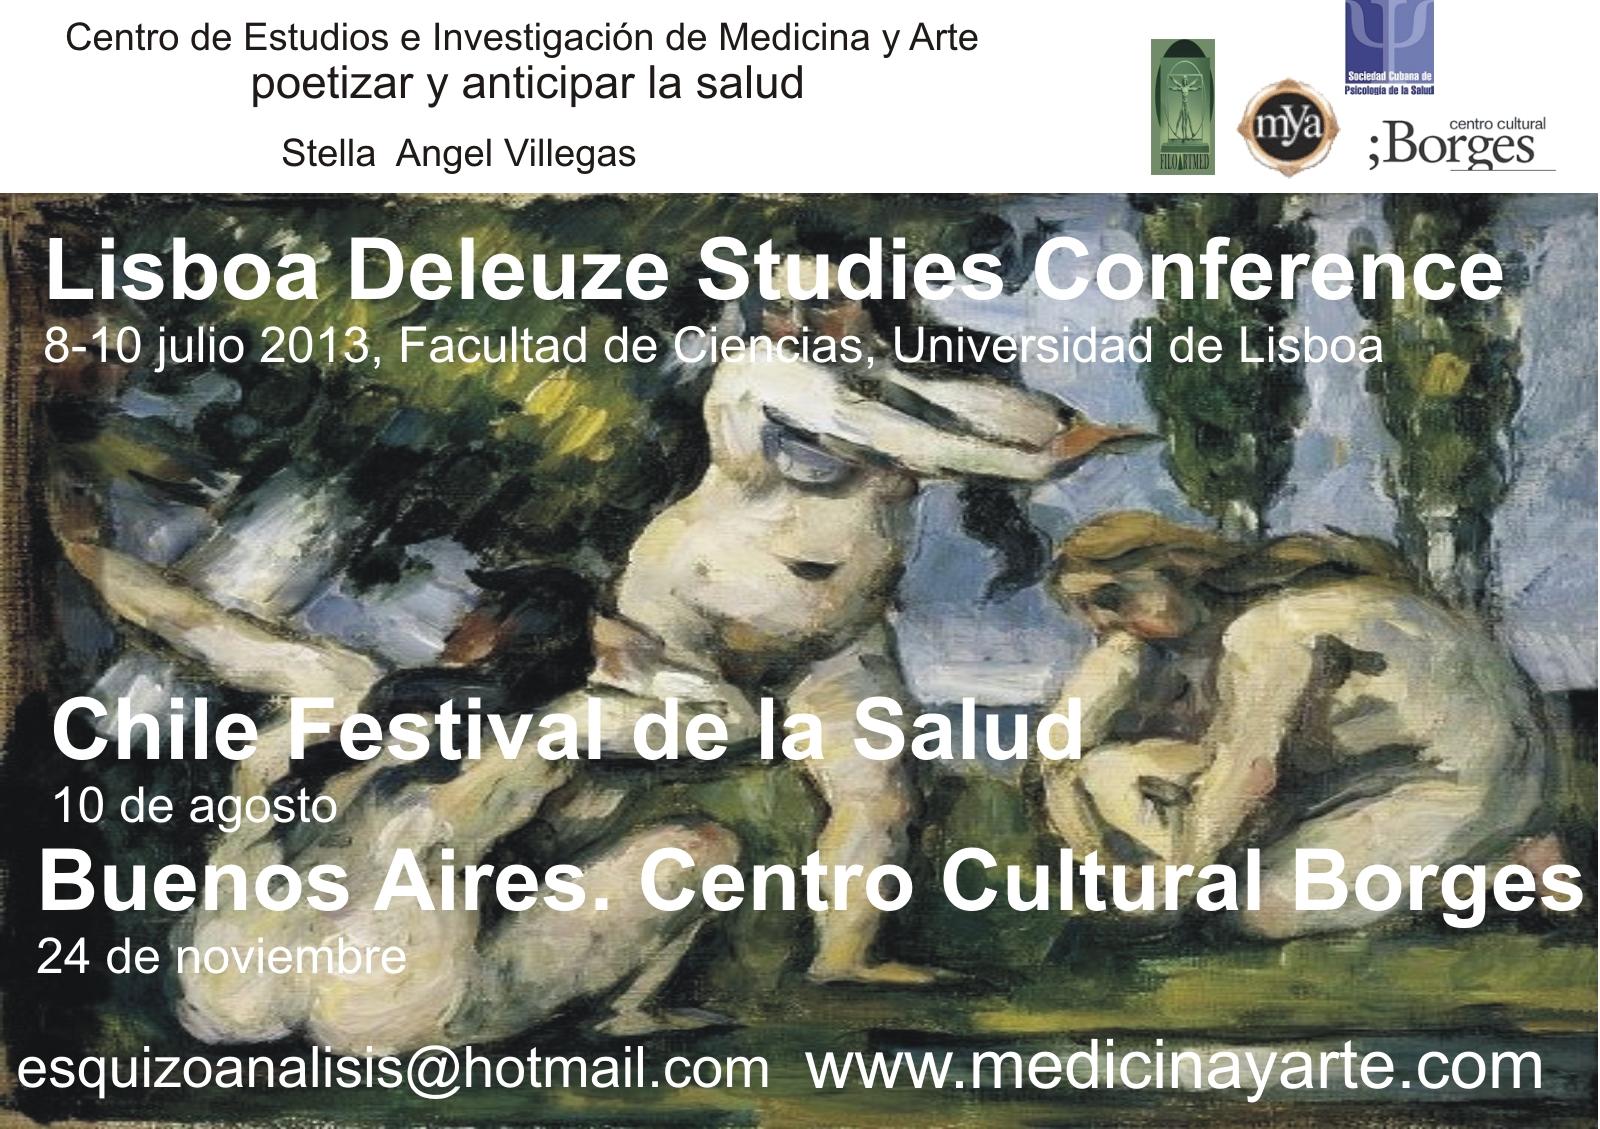 http://www.medicinayarte.com/img/lisboa_chile_laboratorio_2013.jpg